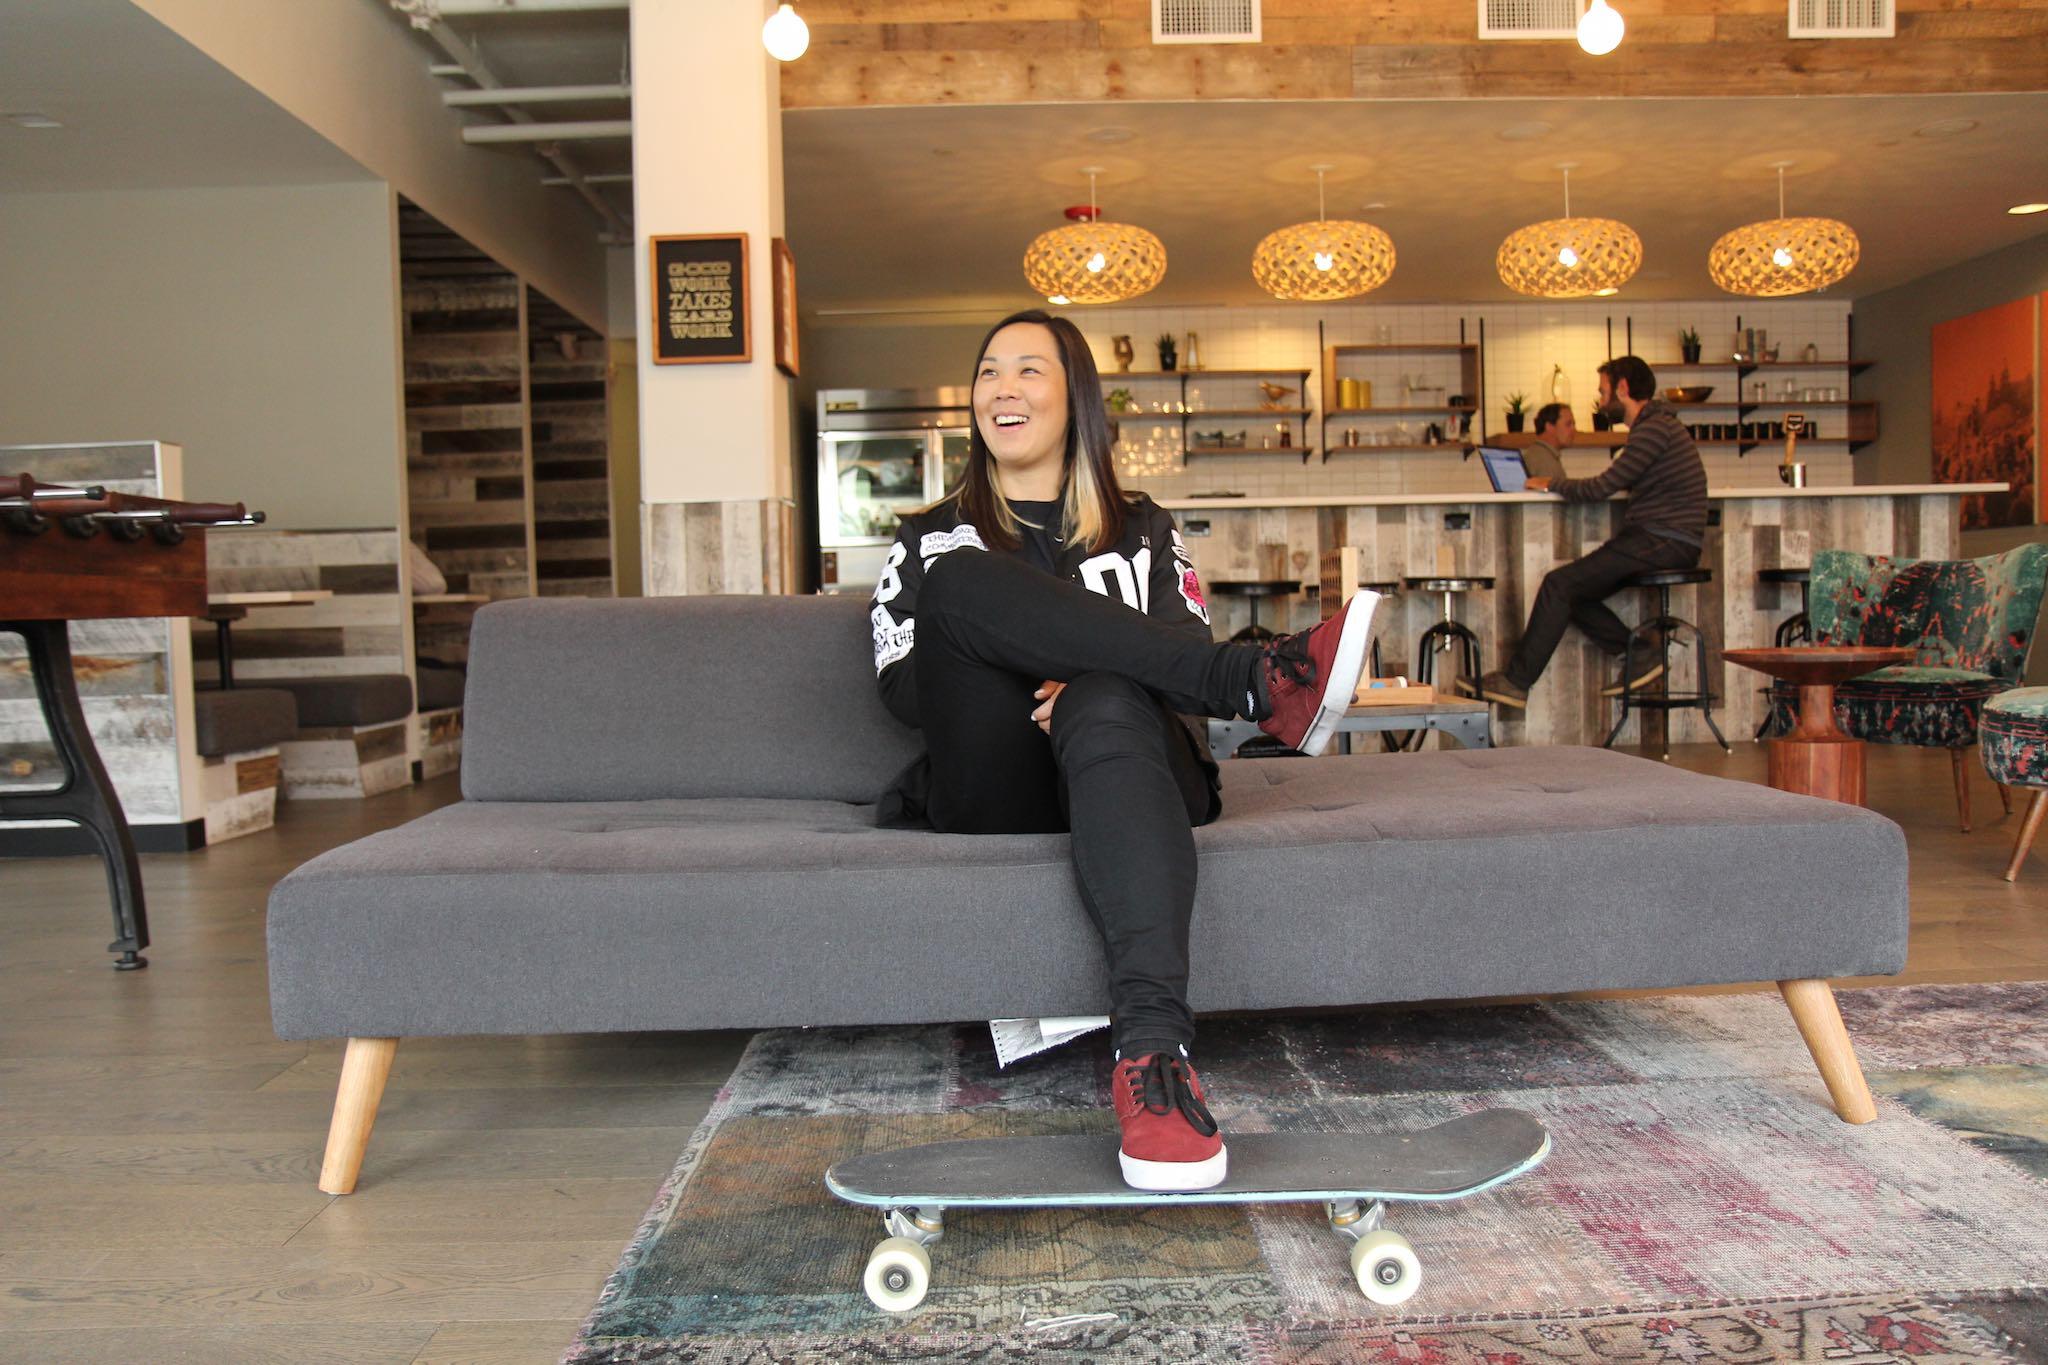 Action Sports Lover Kim Woozy Captures Women 'Literally Taking Flight'3